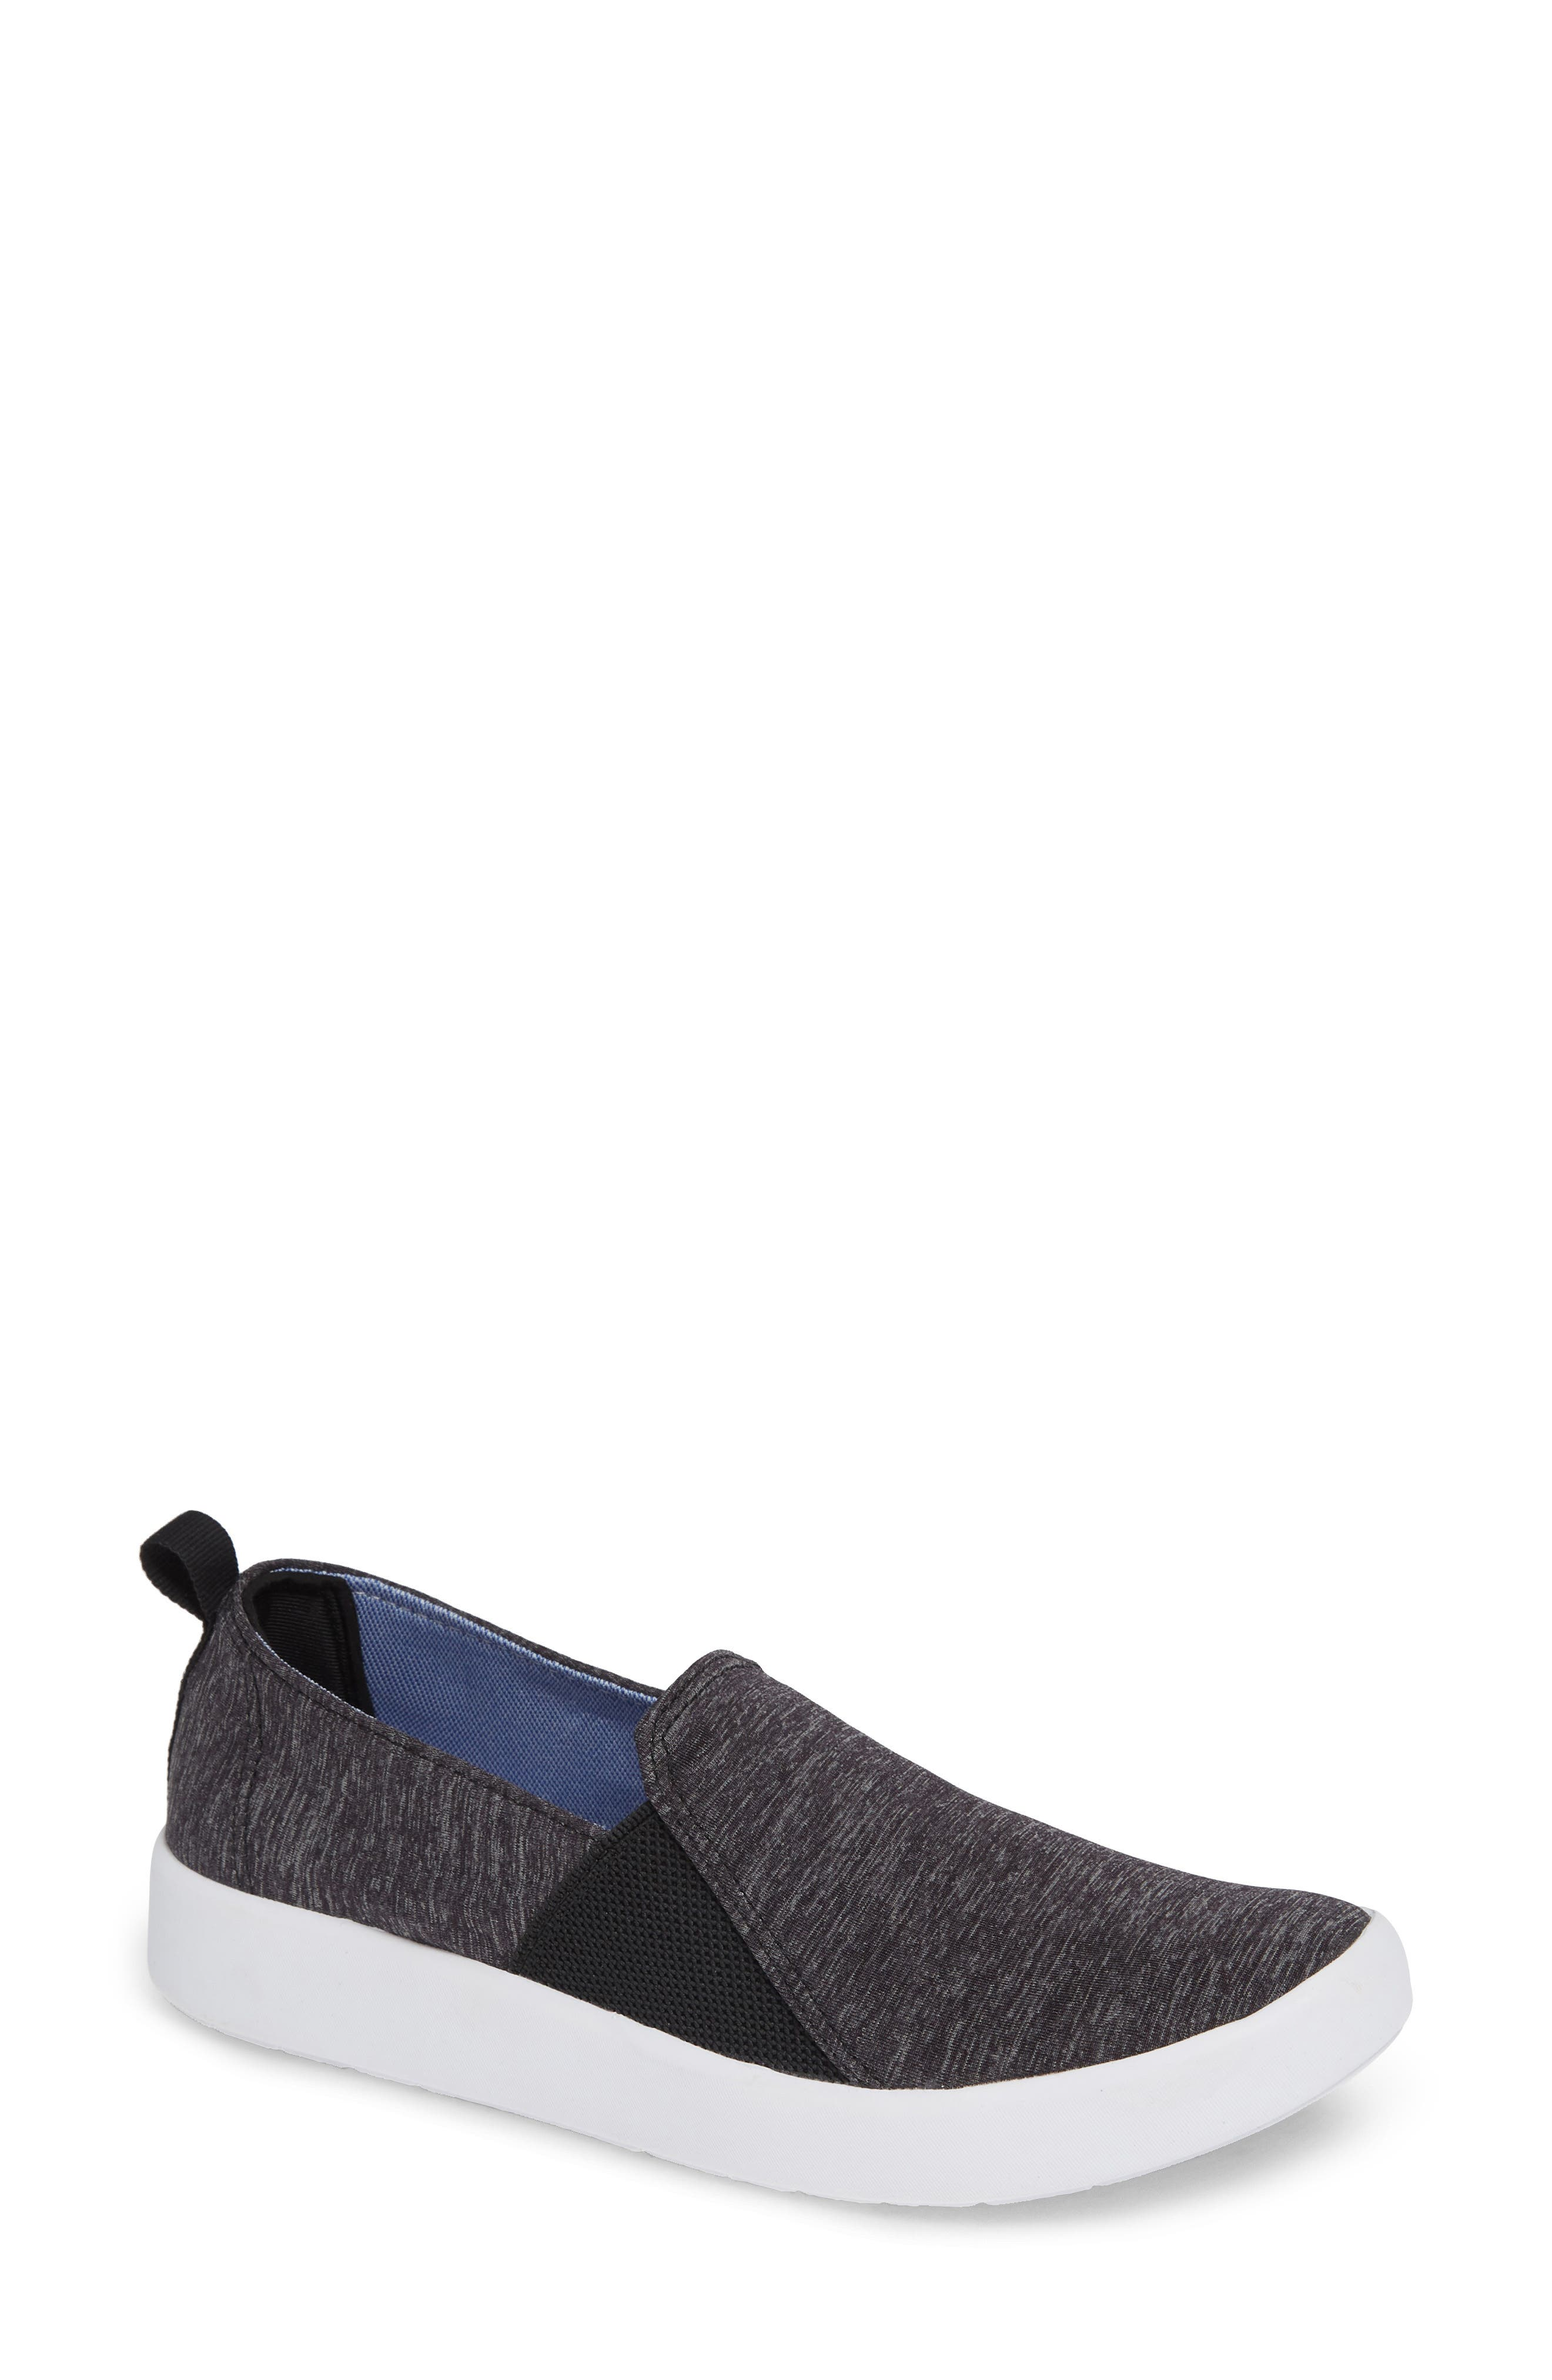 KEDS<SUP>®</SUP> Studio Liv Active Knit Sneaker, Main, color, BLACK